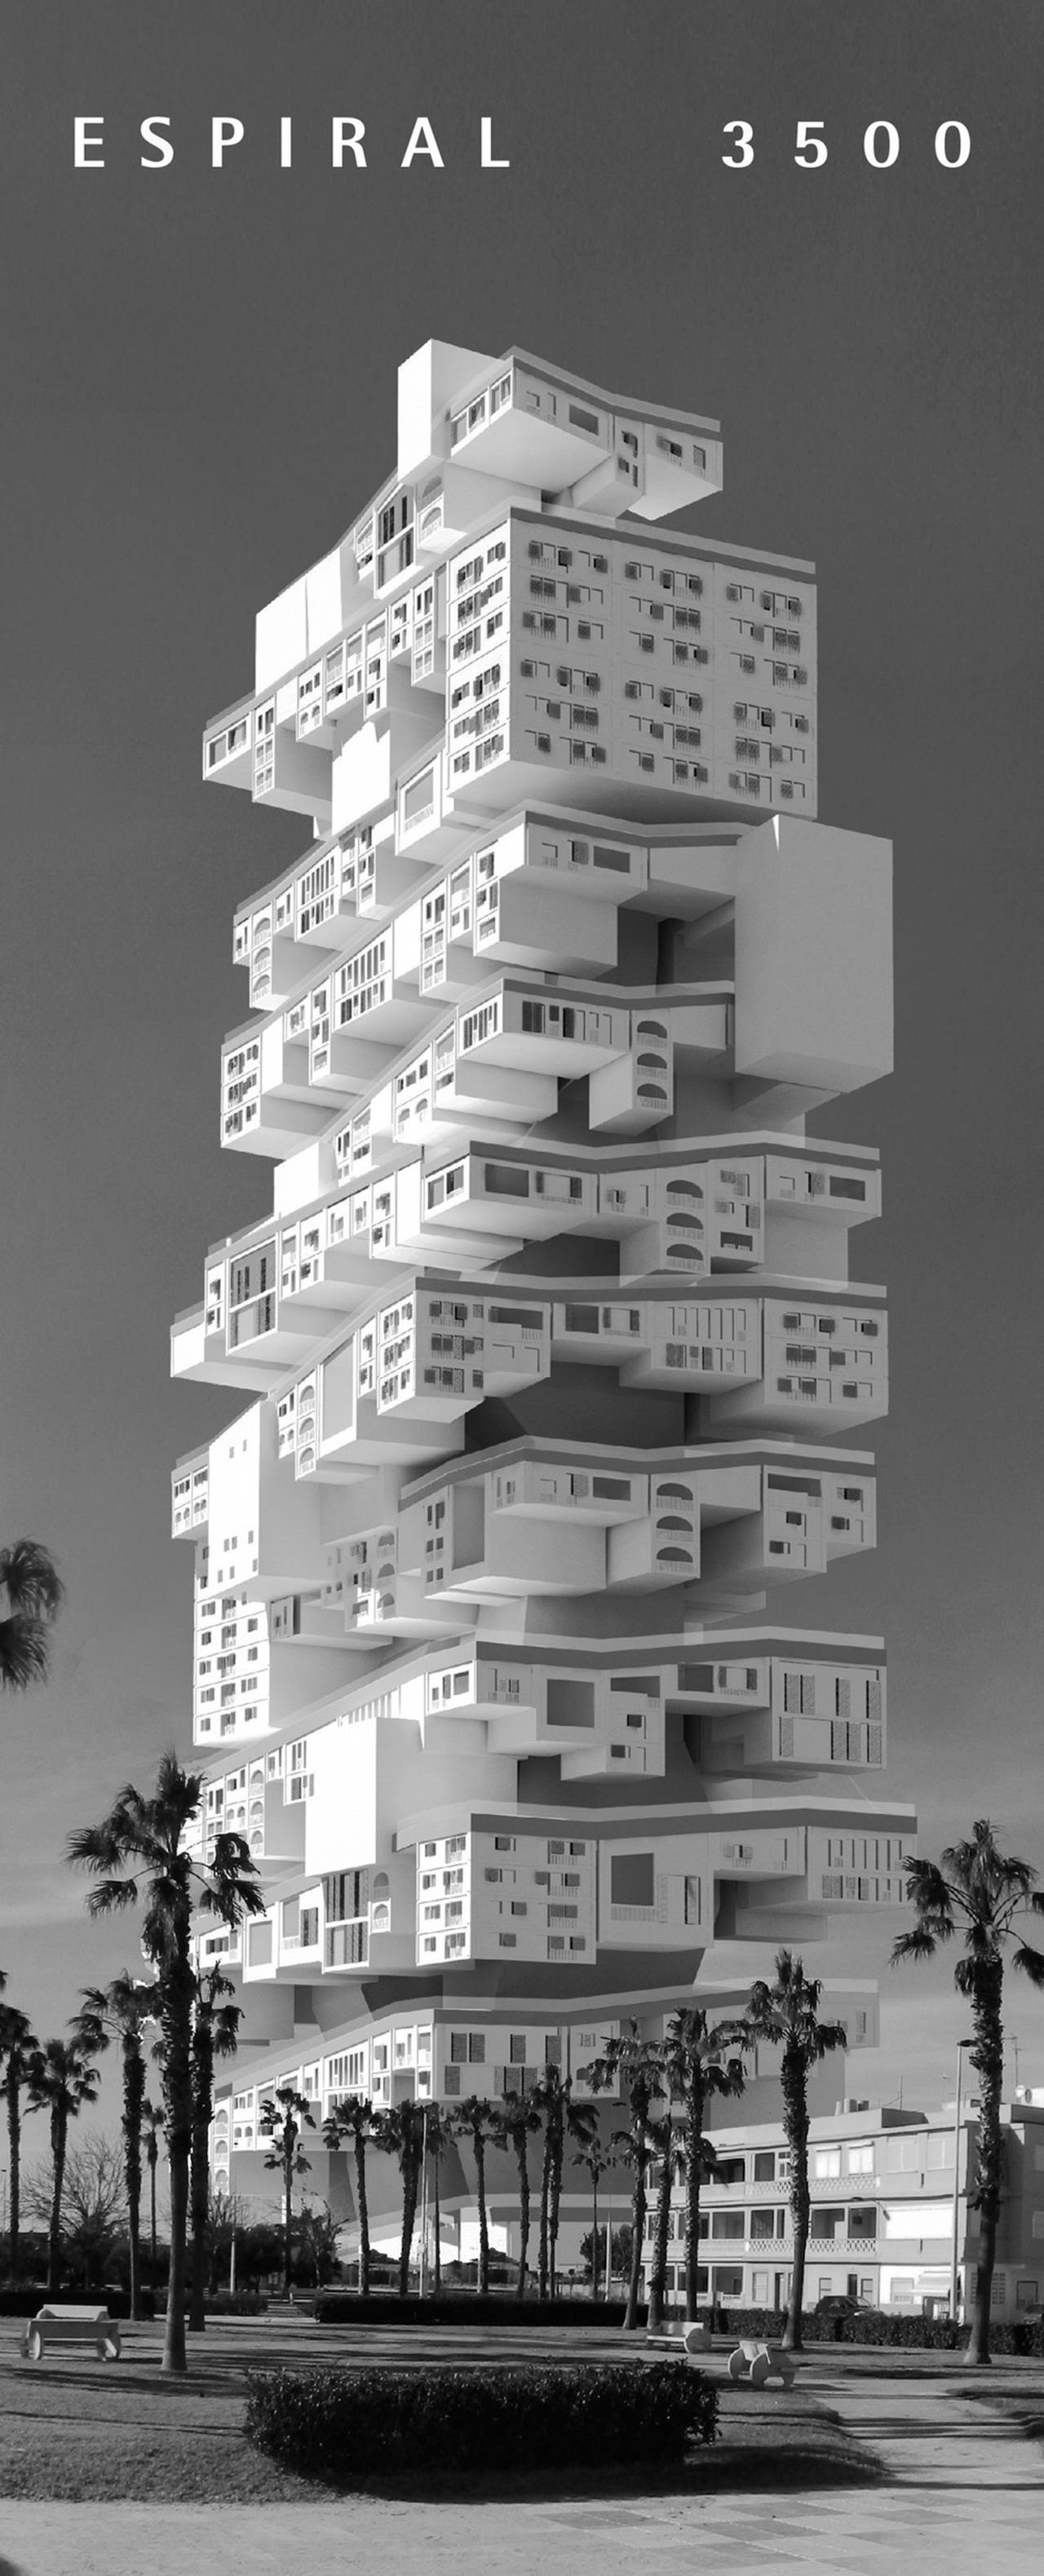 Espiral3500 - third place eVolo Skyscraper Competition 2017 : Photo credit © Javier López-Menchero Ortiz de Salazar